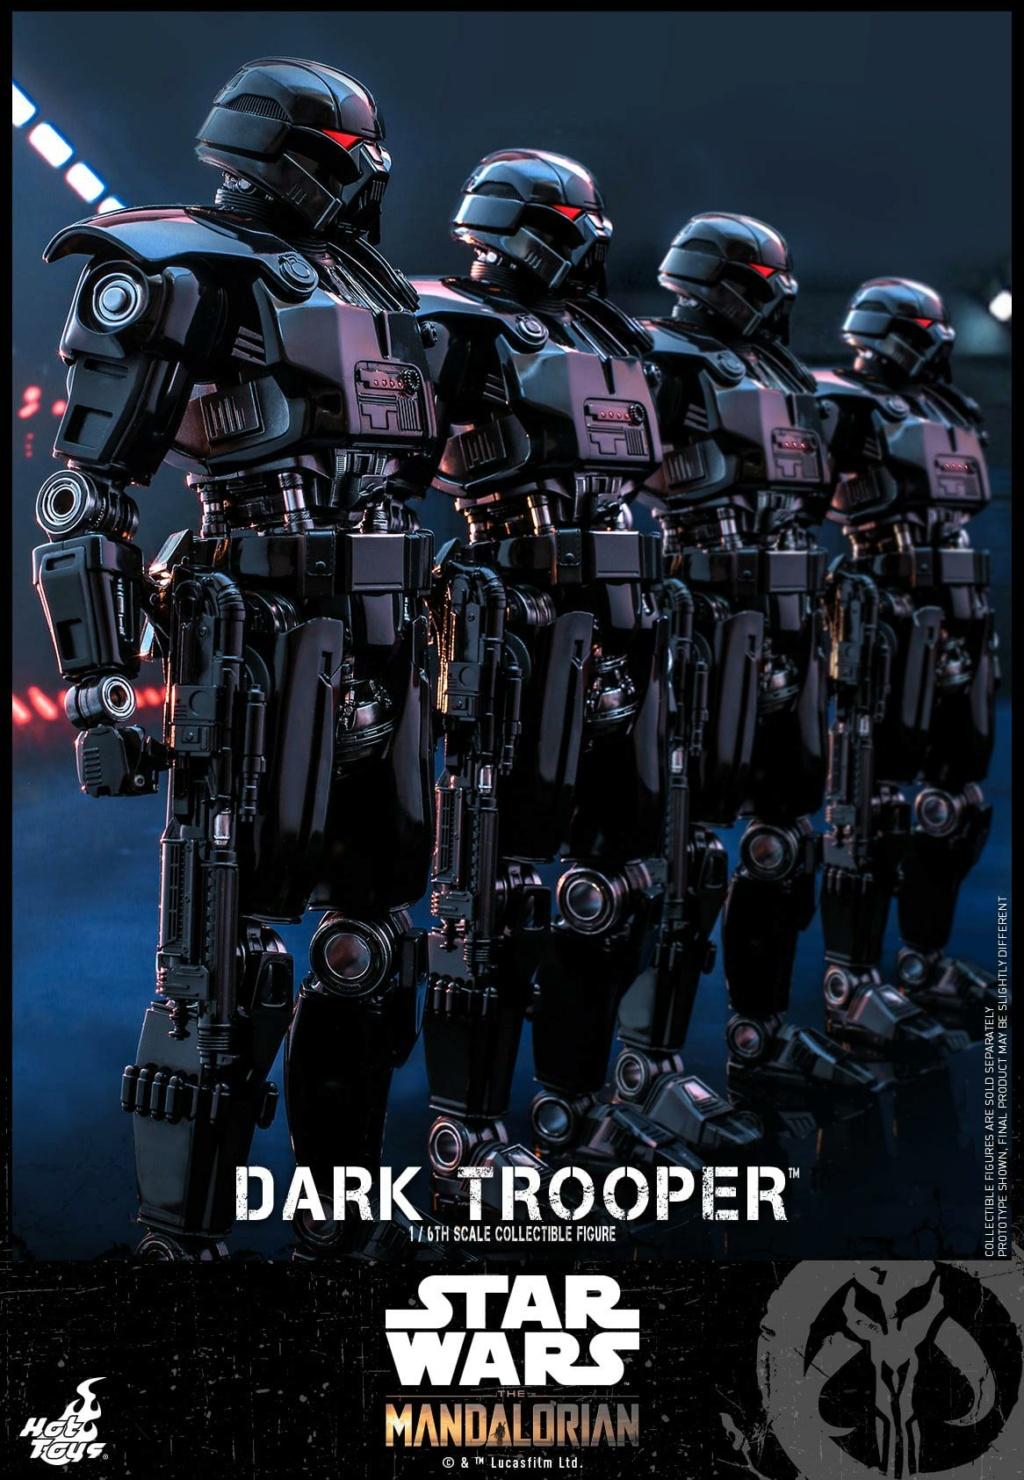 Dark Trooper Collectible Figure - 1/6th scale - Hot Toys Dark_t16